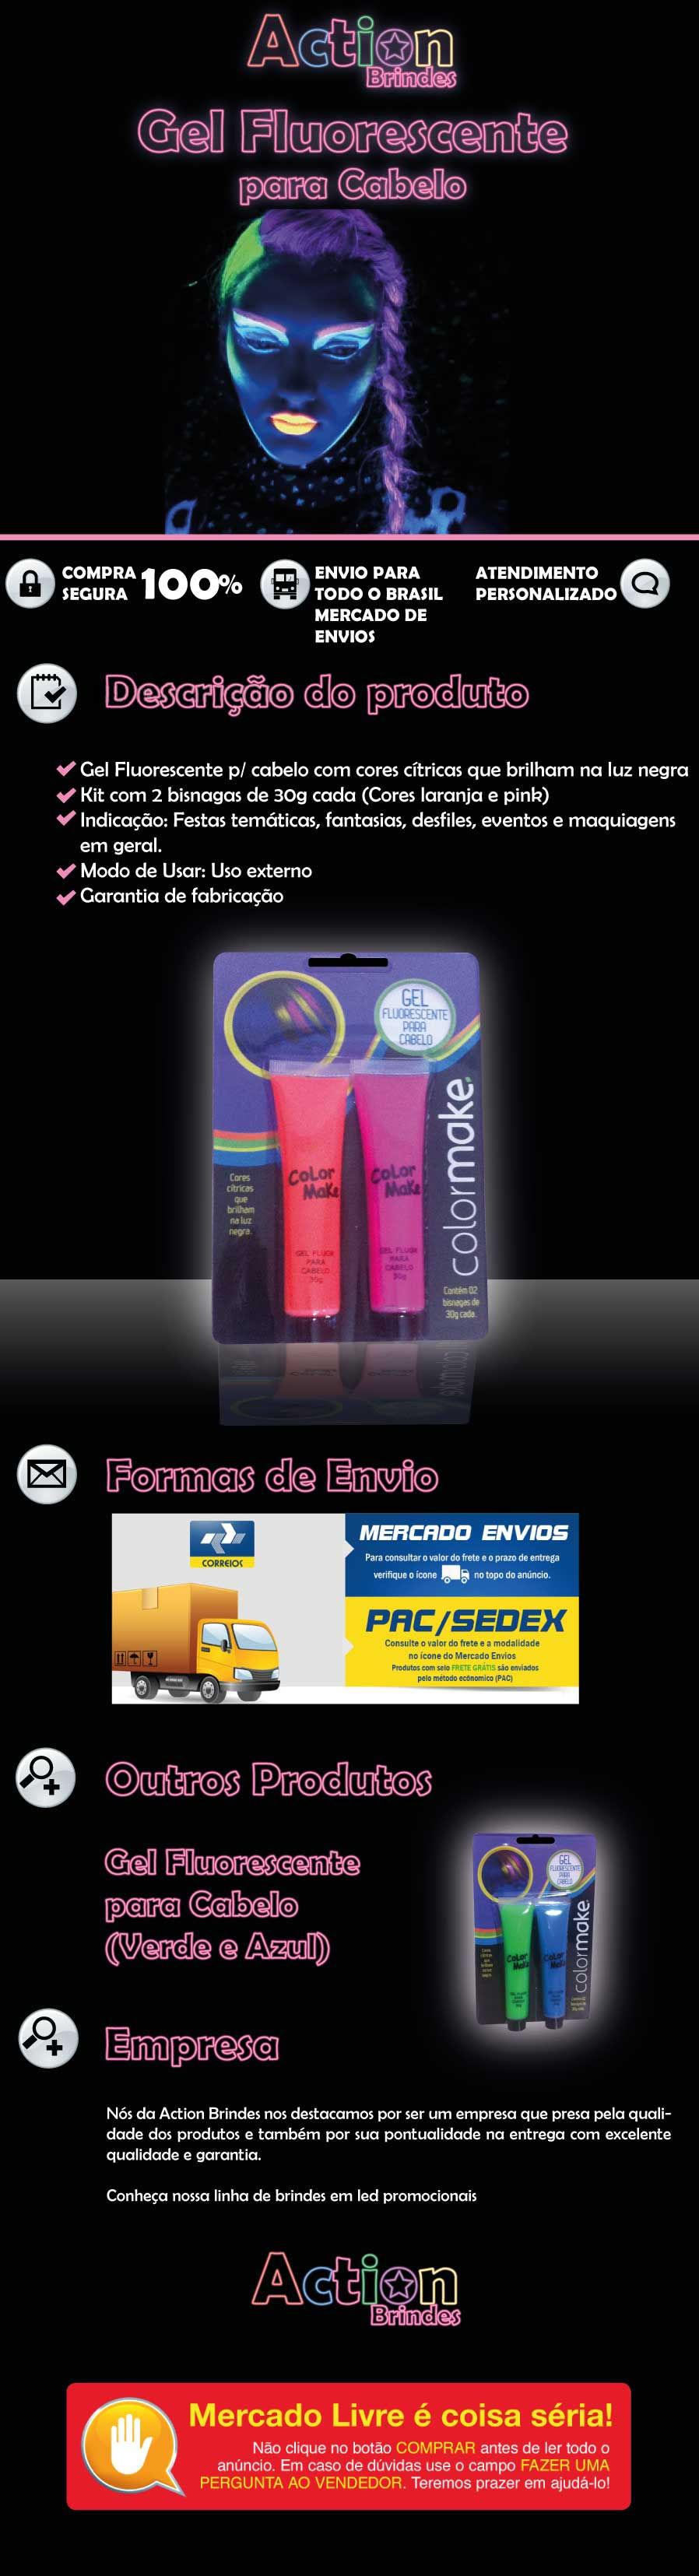 Gel Fluorescente Para Cabelo laranja e pink